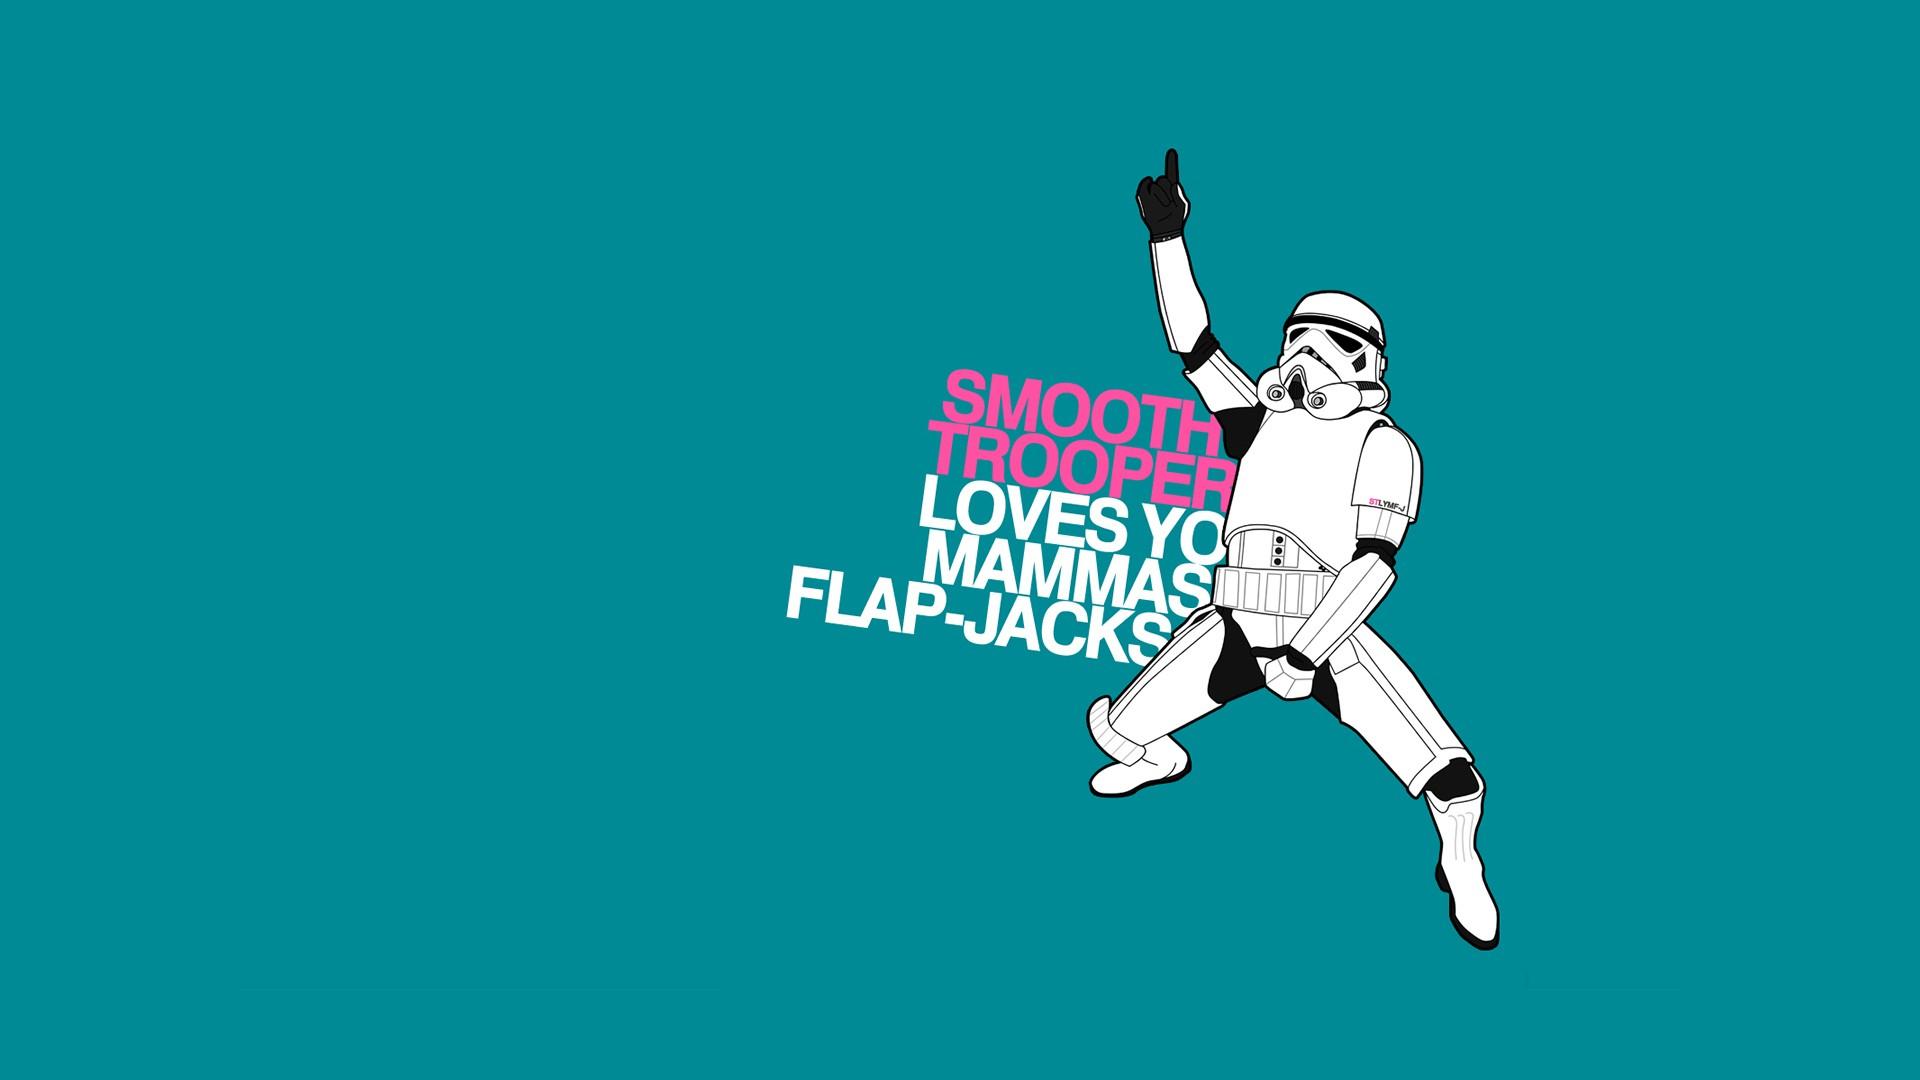 Wallpaper Illustration Star Wars Cartoon Stormtrooper Brand 1920x1080 Chipchap90 144218 Hd Wallpapers Wallhere